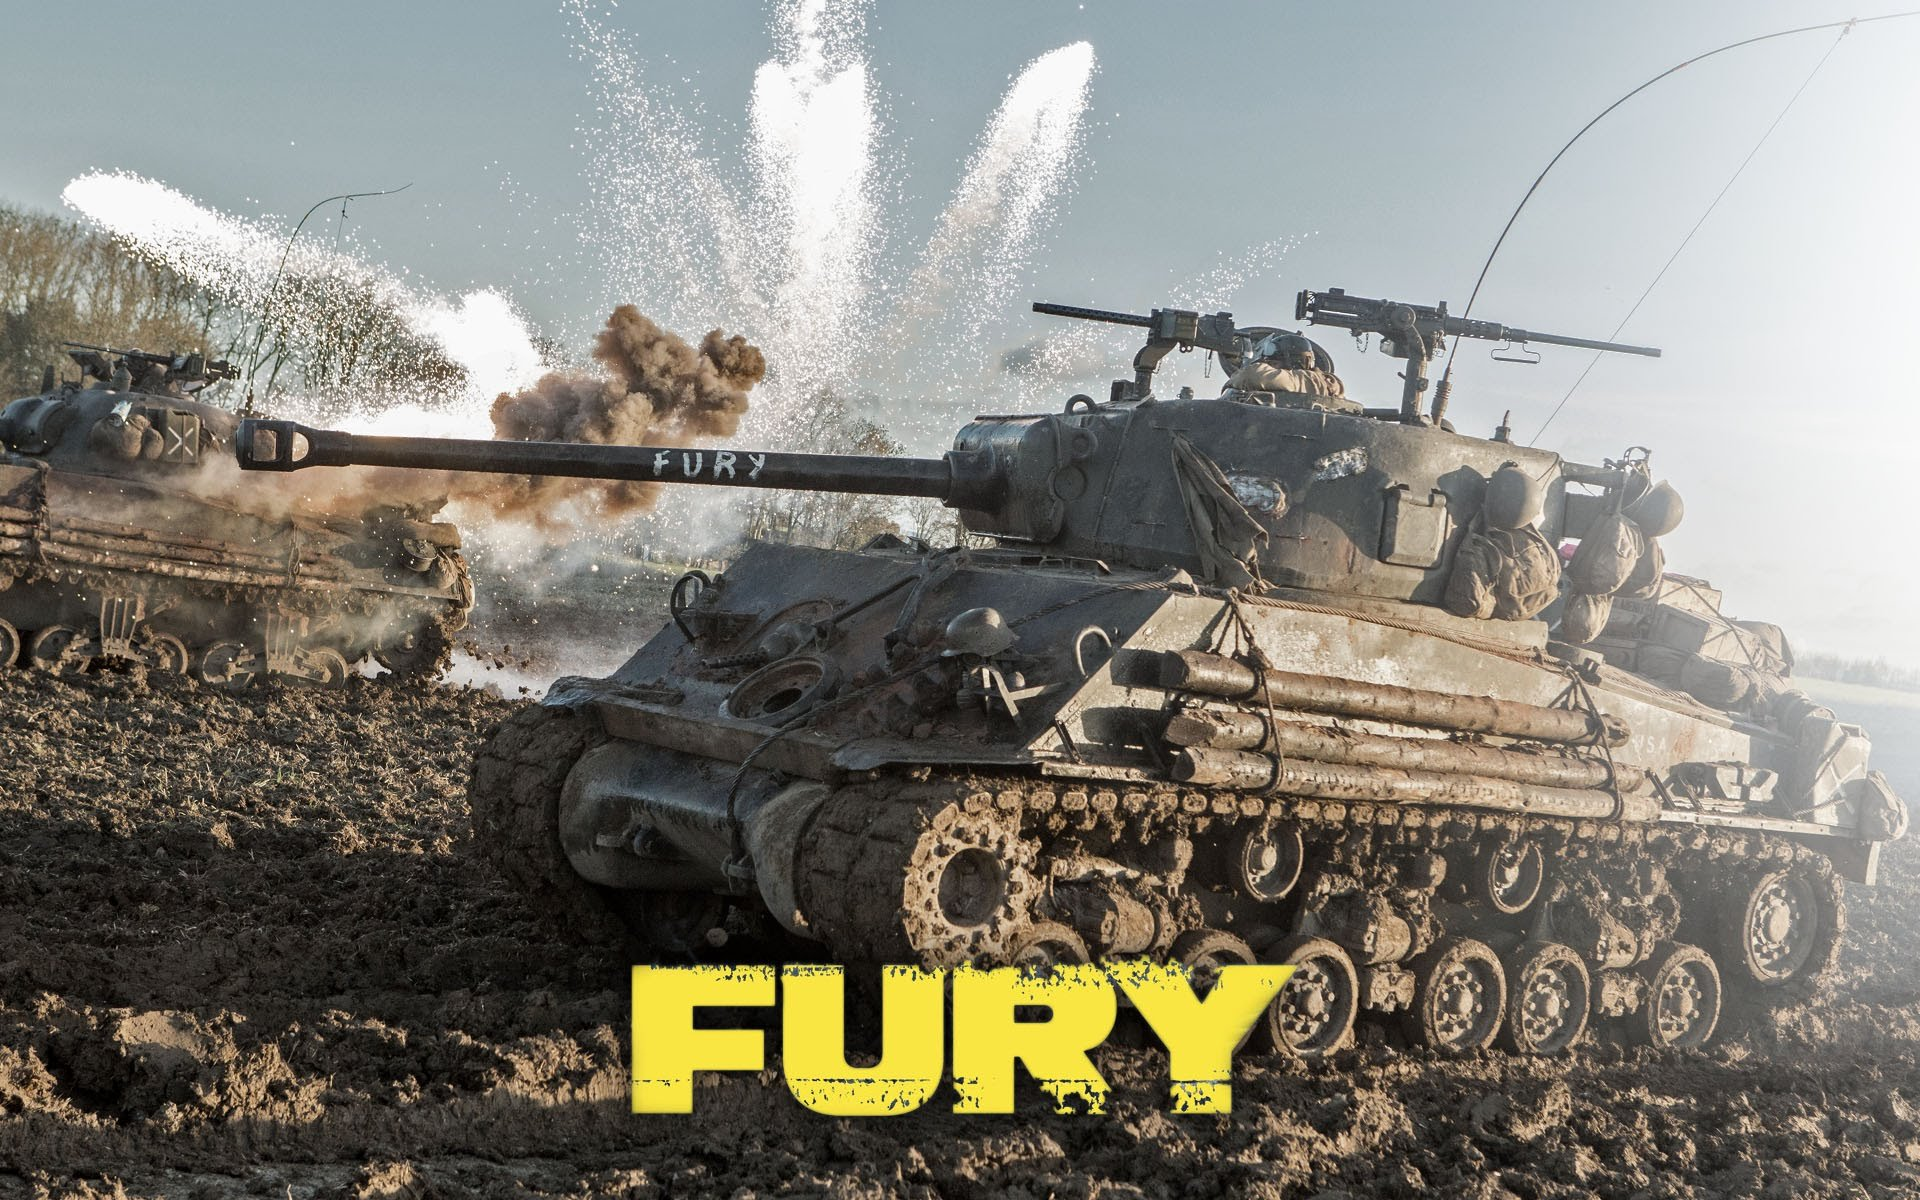 FURY action drama war brad pitt military tank war 1fury fighting 1920x1200